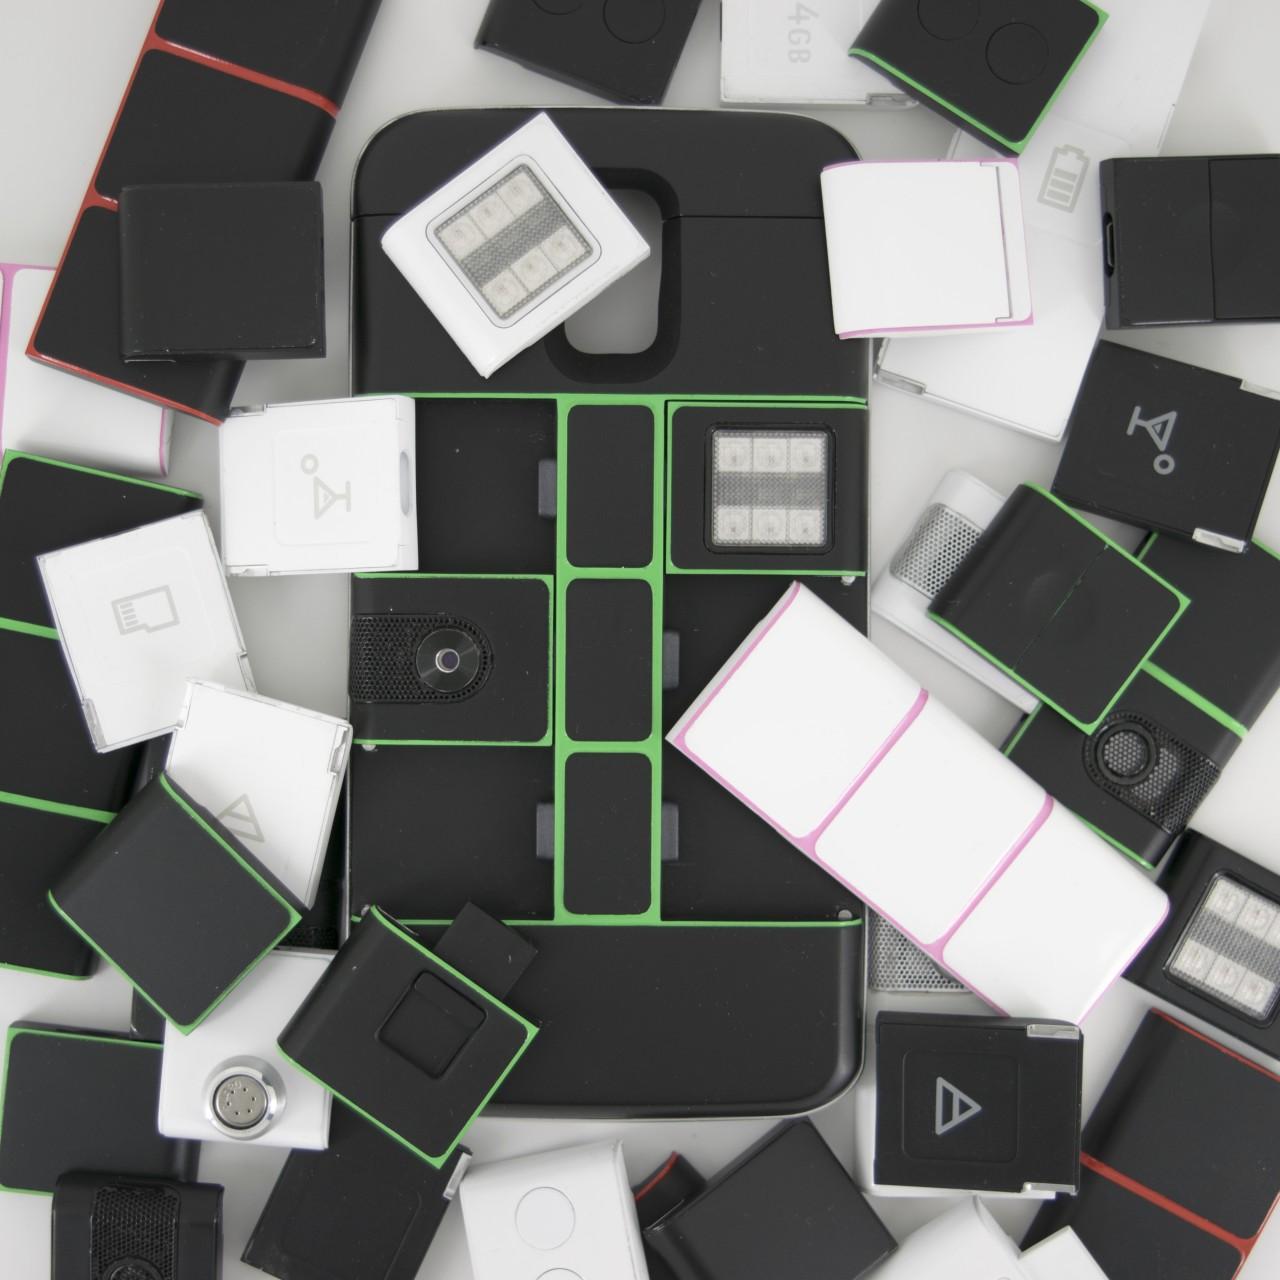 black-nexpaq-case-with-modules-1280x1280.jpeg